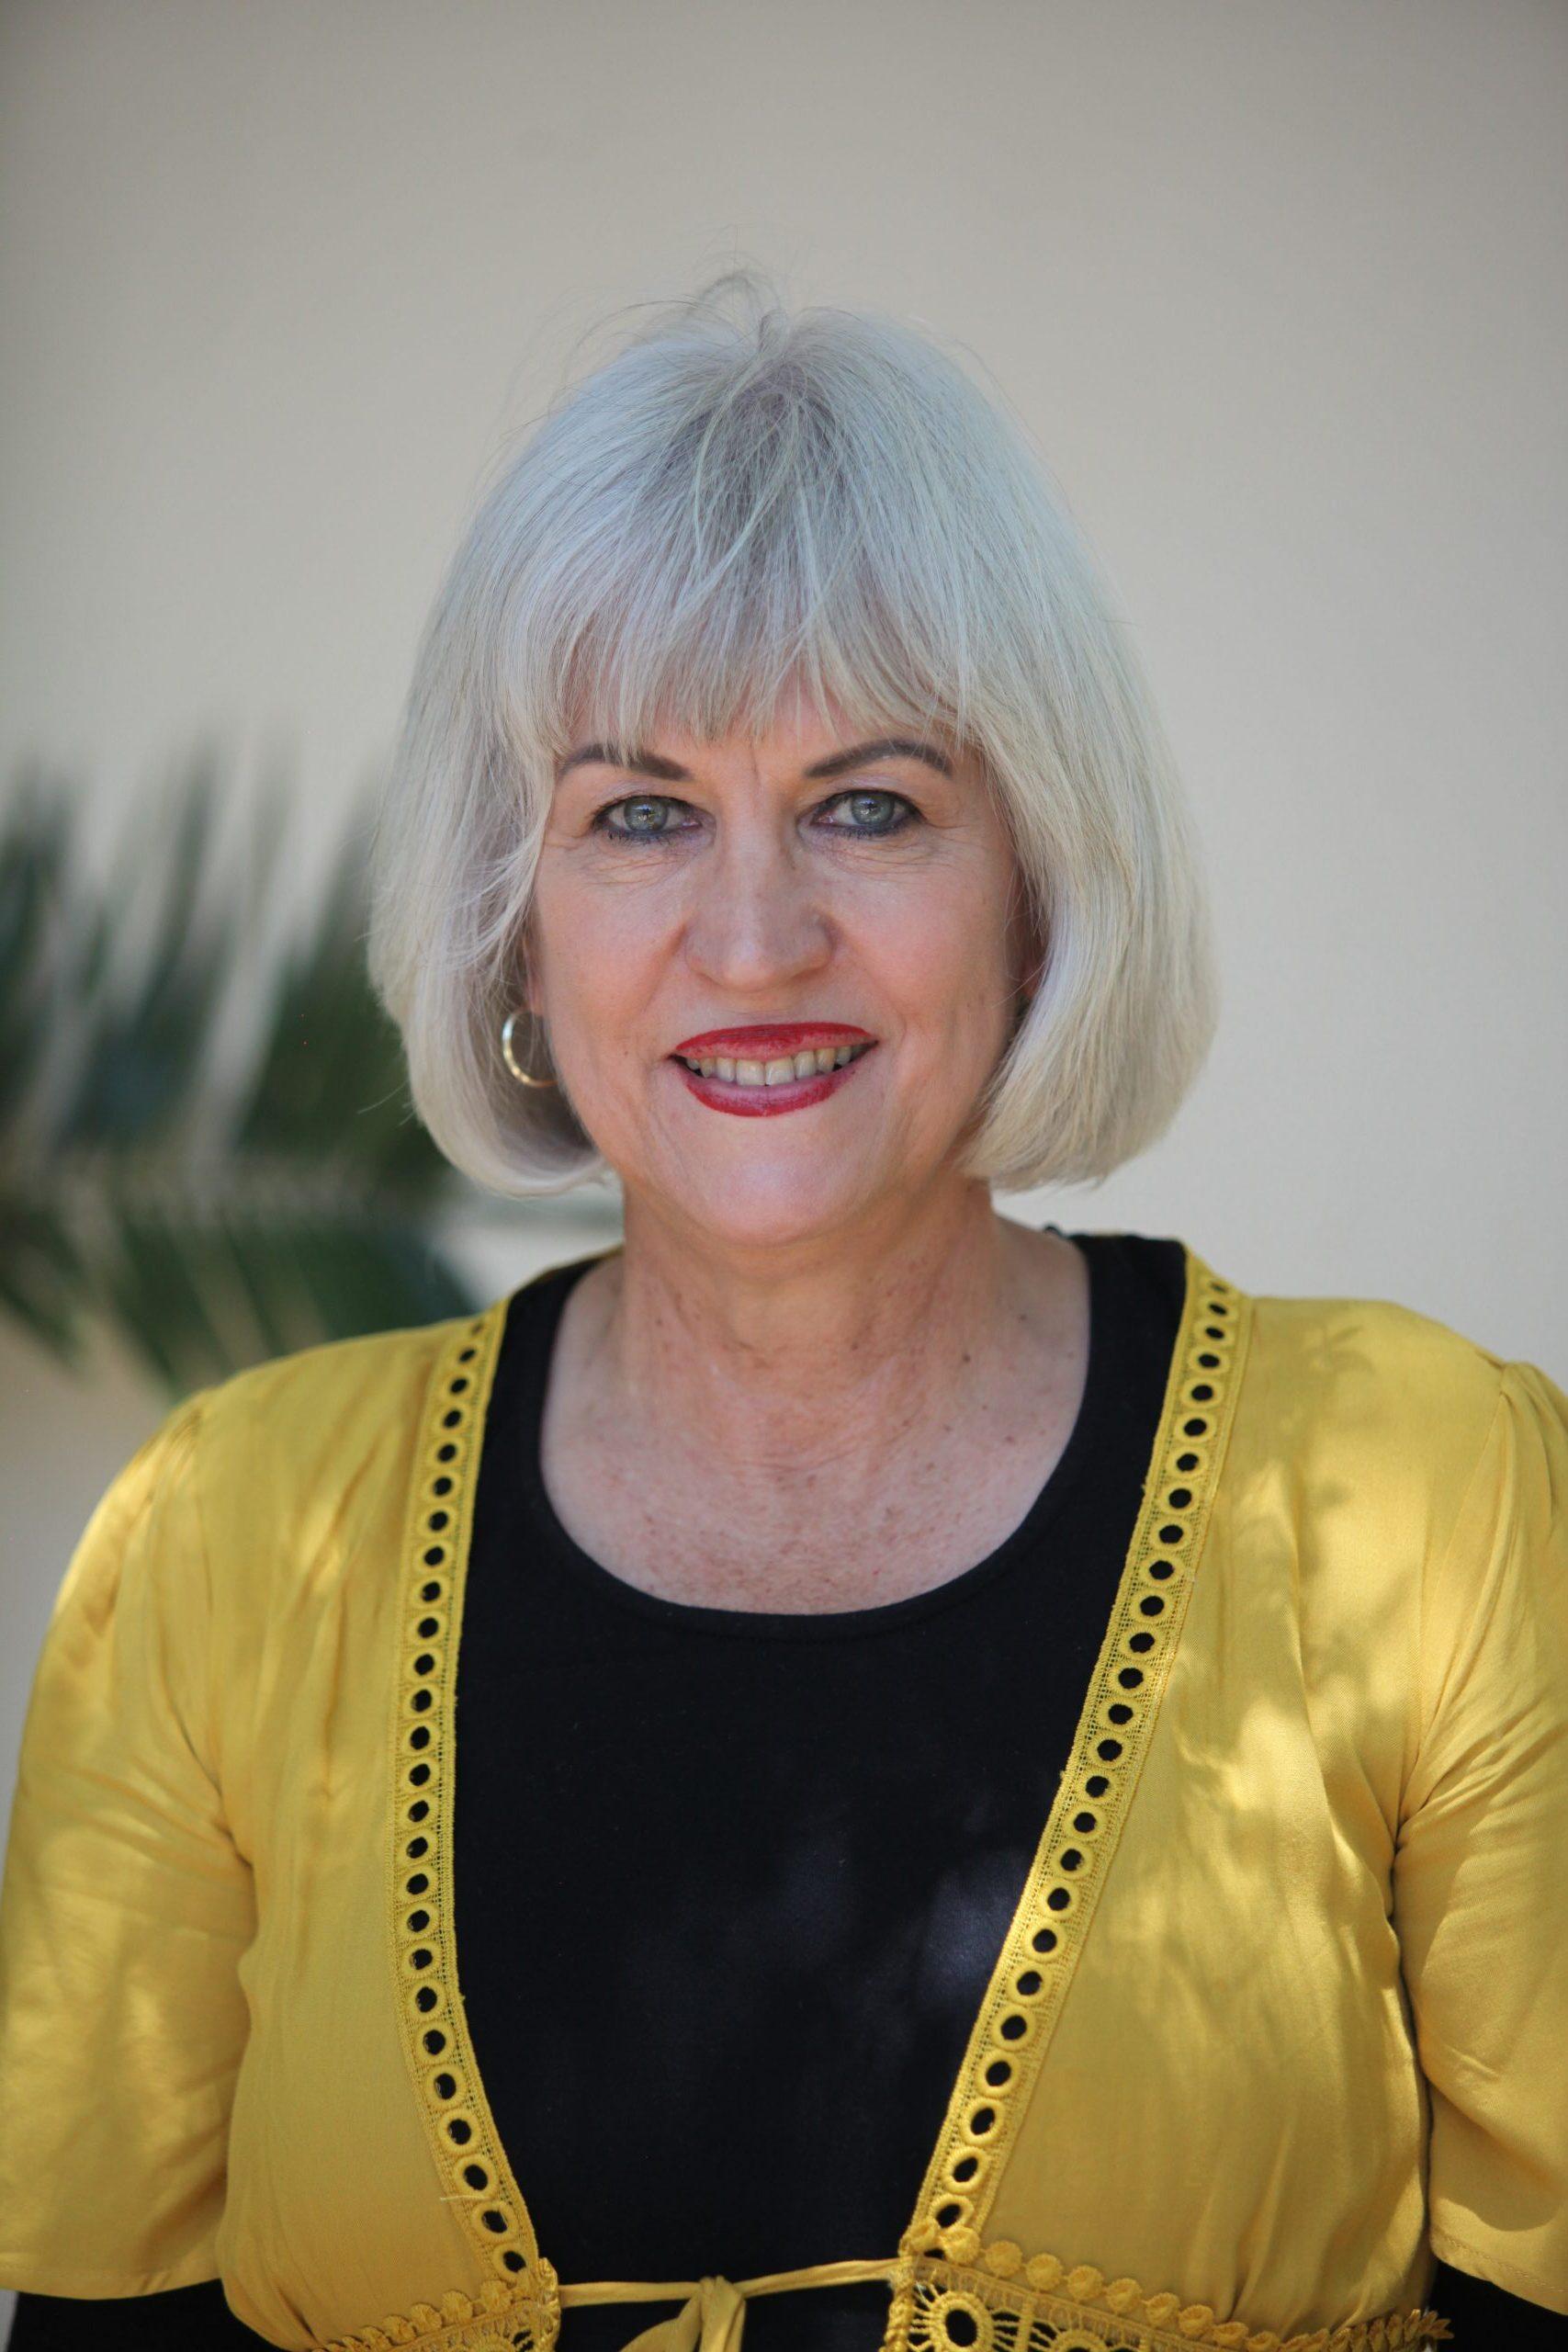 Elaine van der Merwe